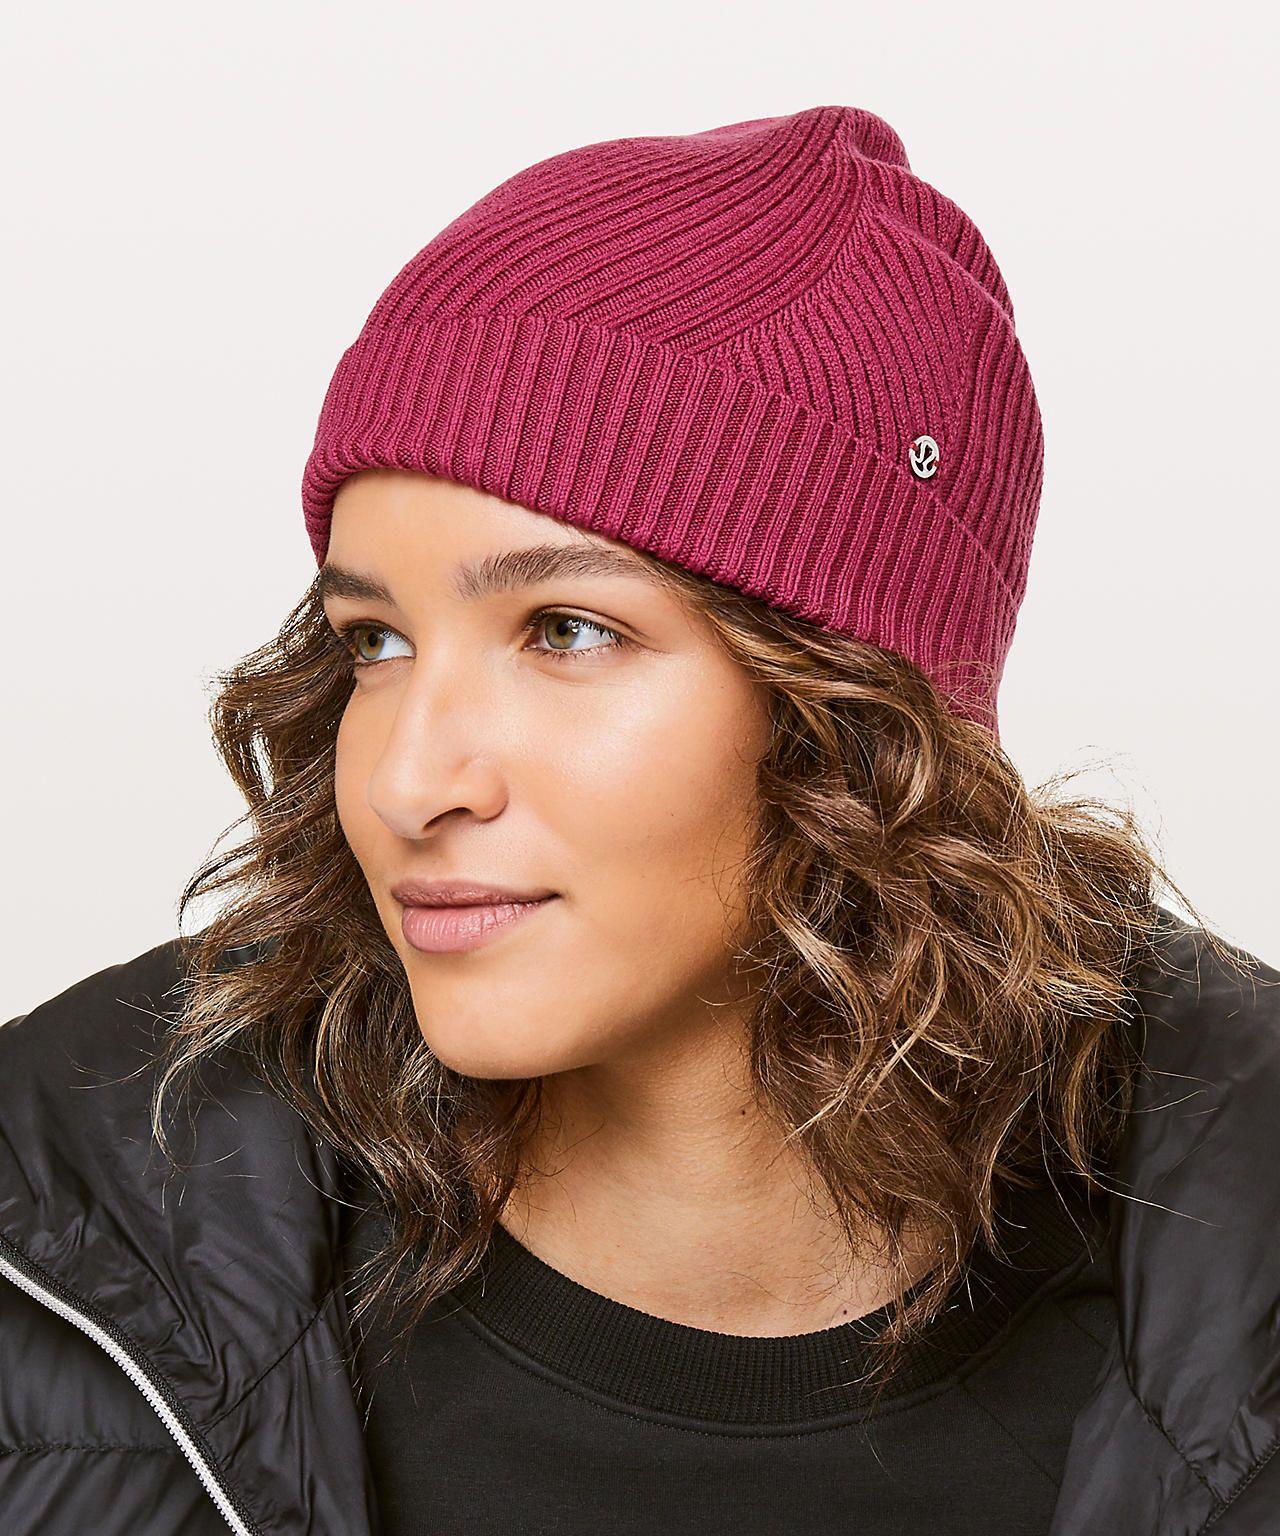 Violet Red Headbands For Women 2f9e6124b540